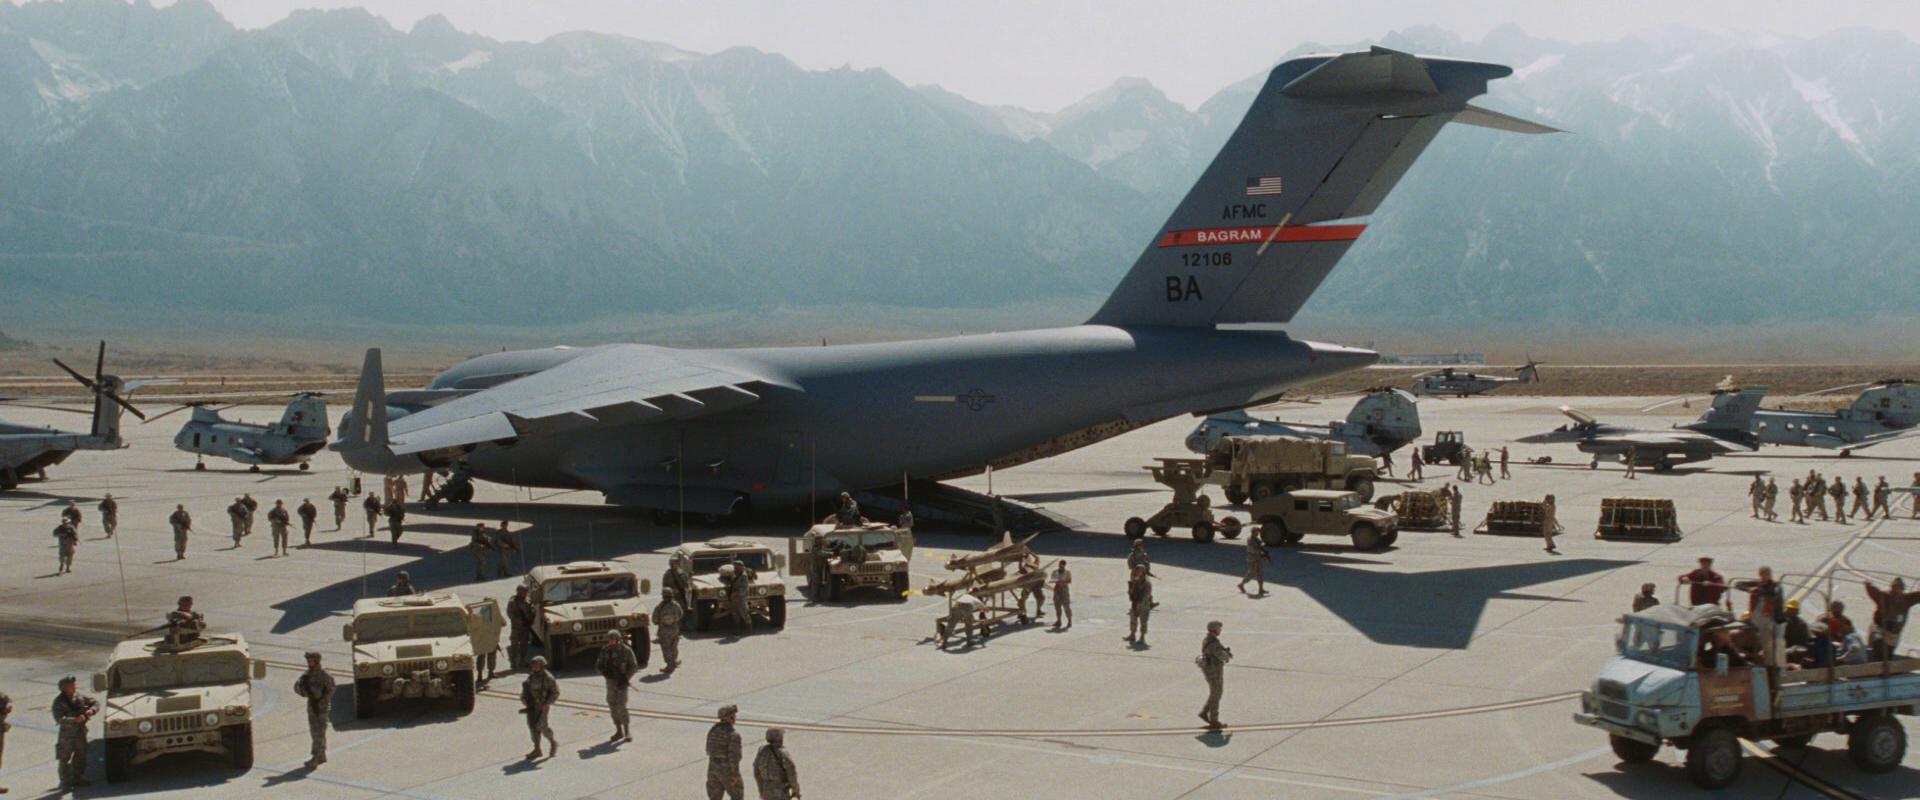 Bagram Air Base | Marvel Cinematic Universe Wiki